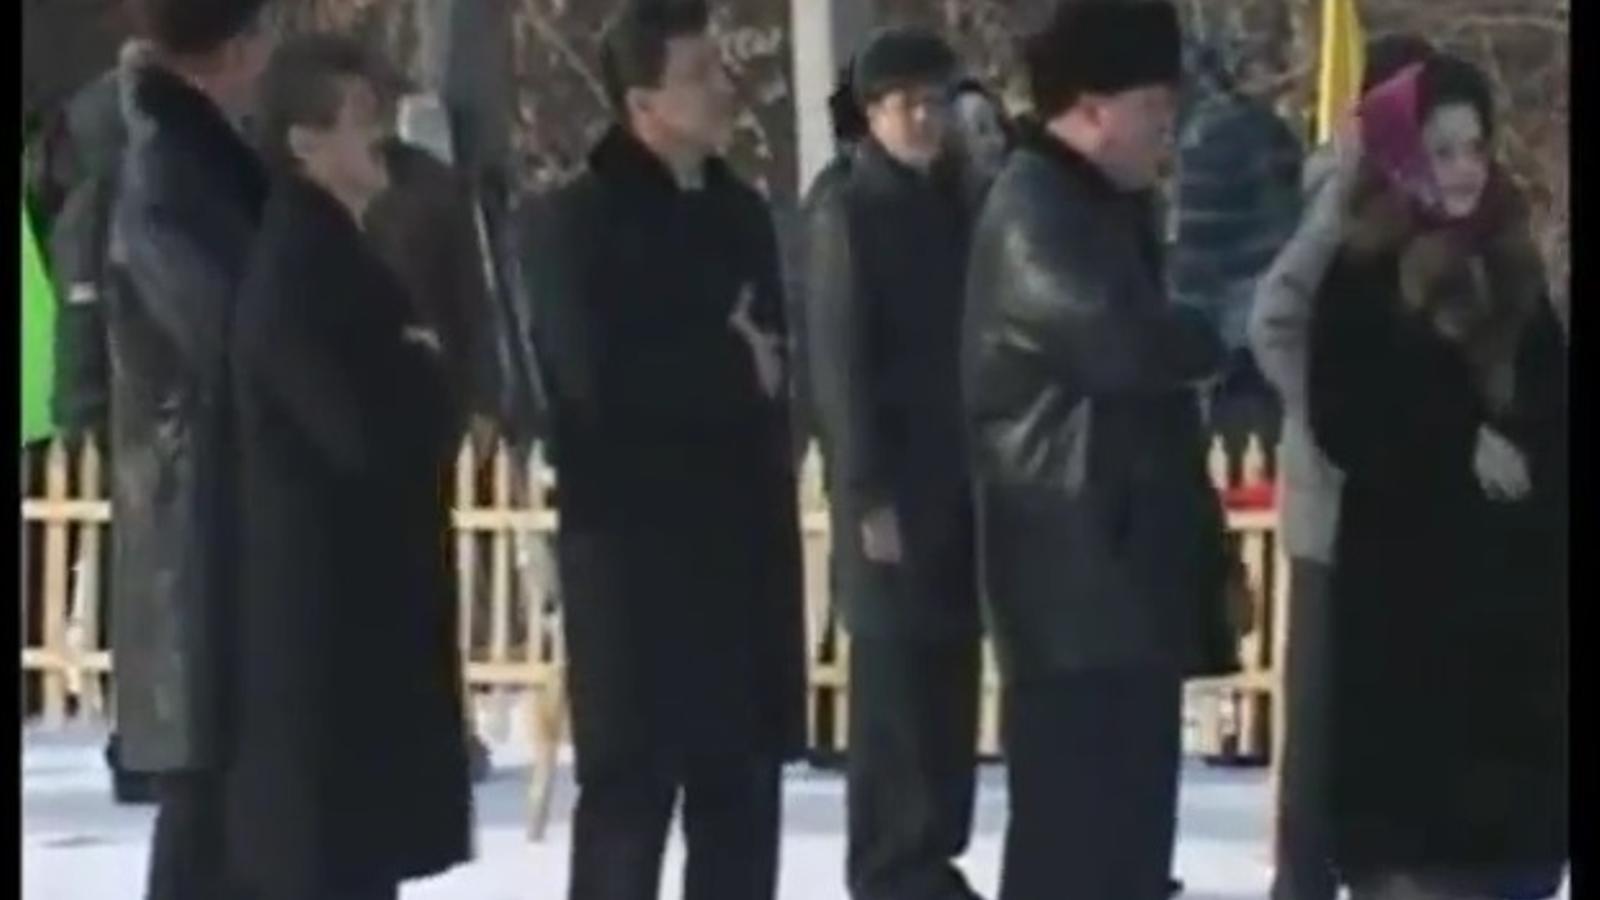 'Living la vida loca', de Ricky Martin, convertida per error en el nou himne nacional del Kazakhstan